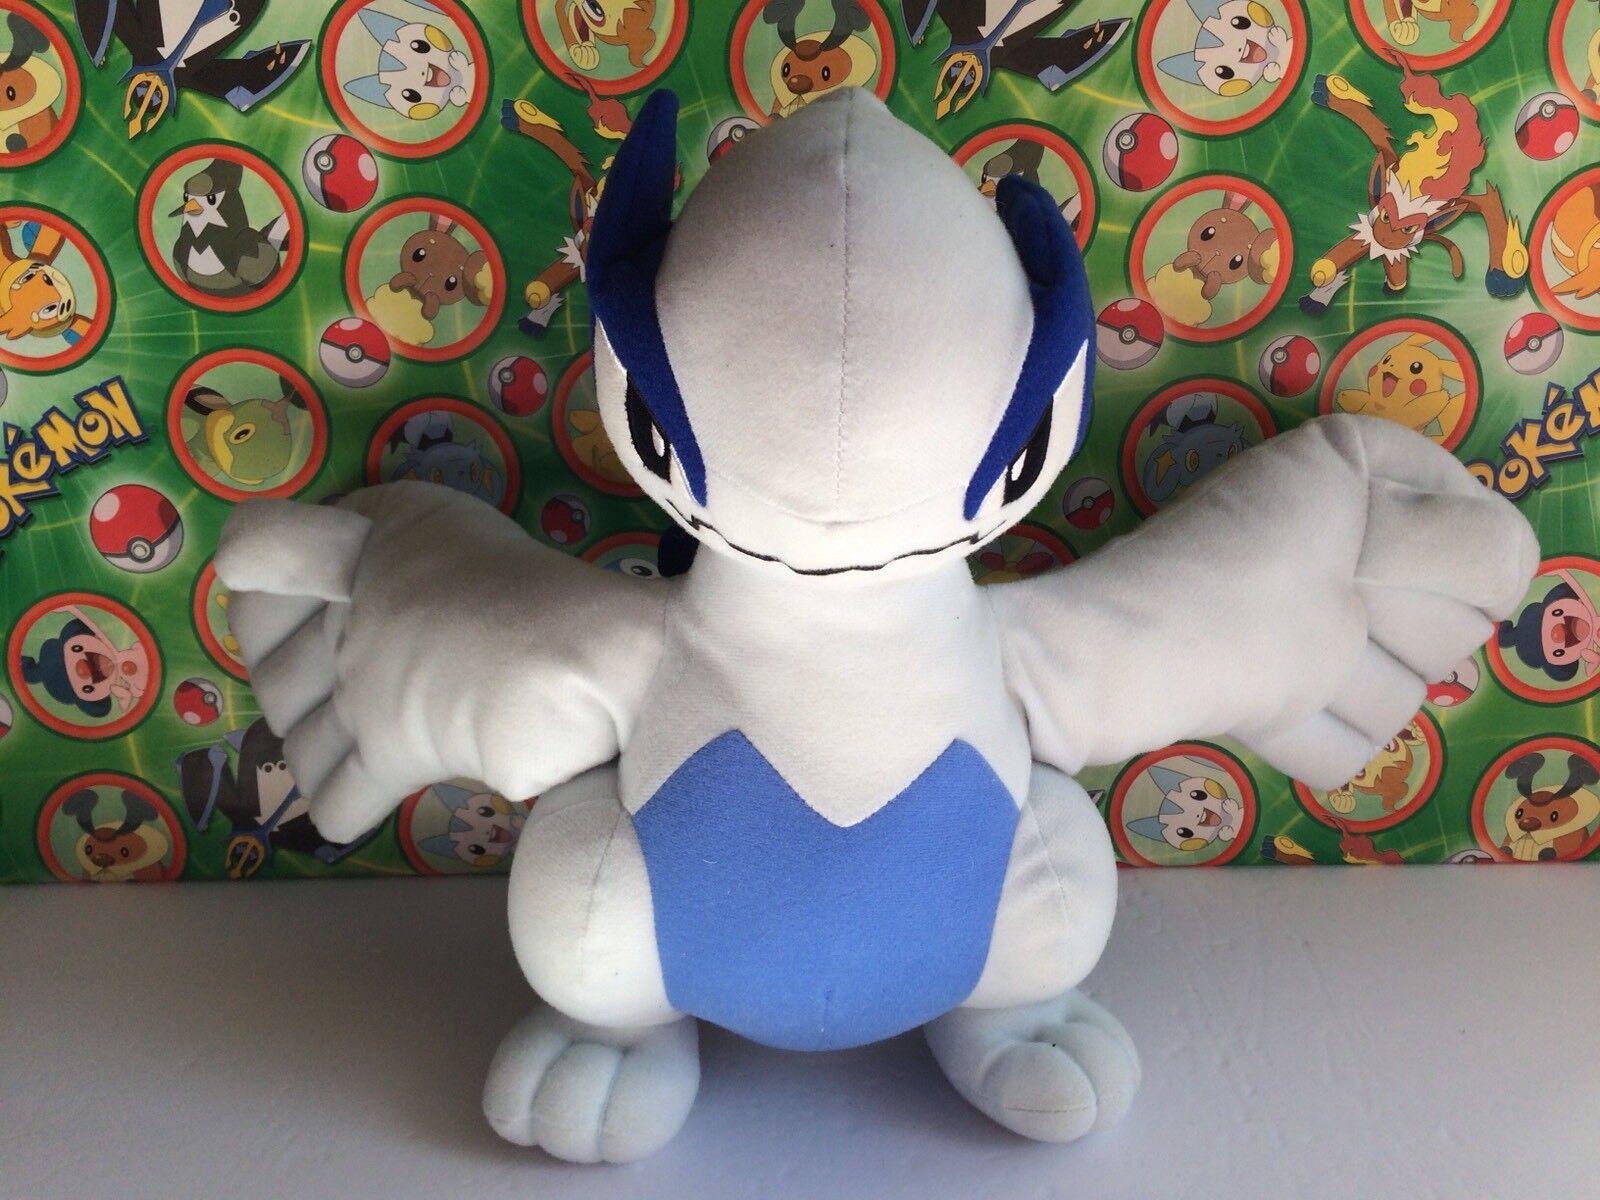 Pokemon Plush Lugia Doll 2009 DX UFO Prize 11  stuffed animal figure USA Seller